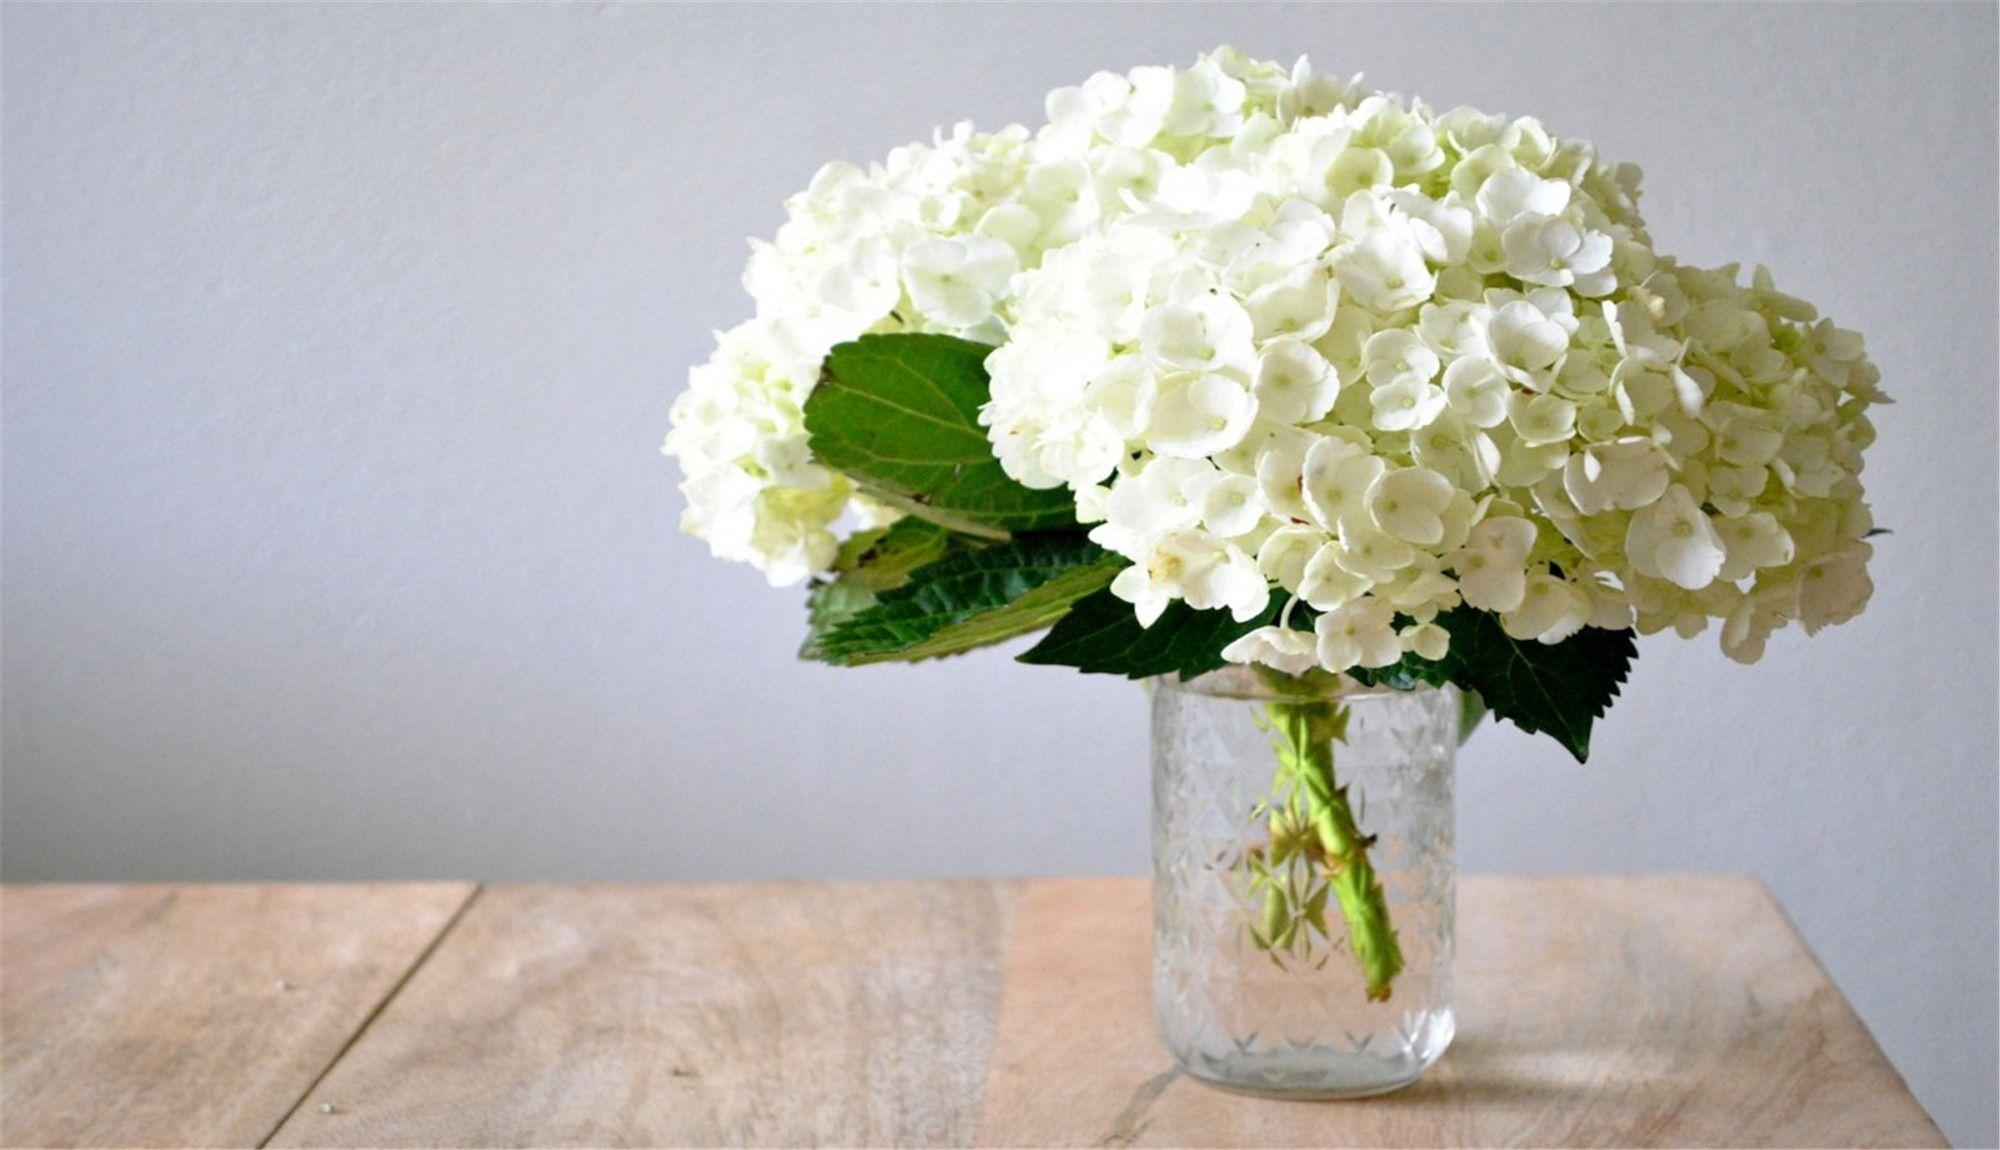 Hydrangea (/haɪˈdreɪndʒⁱə/;[1] common names hydrangea or